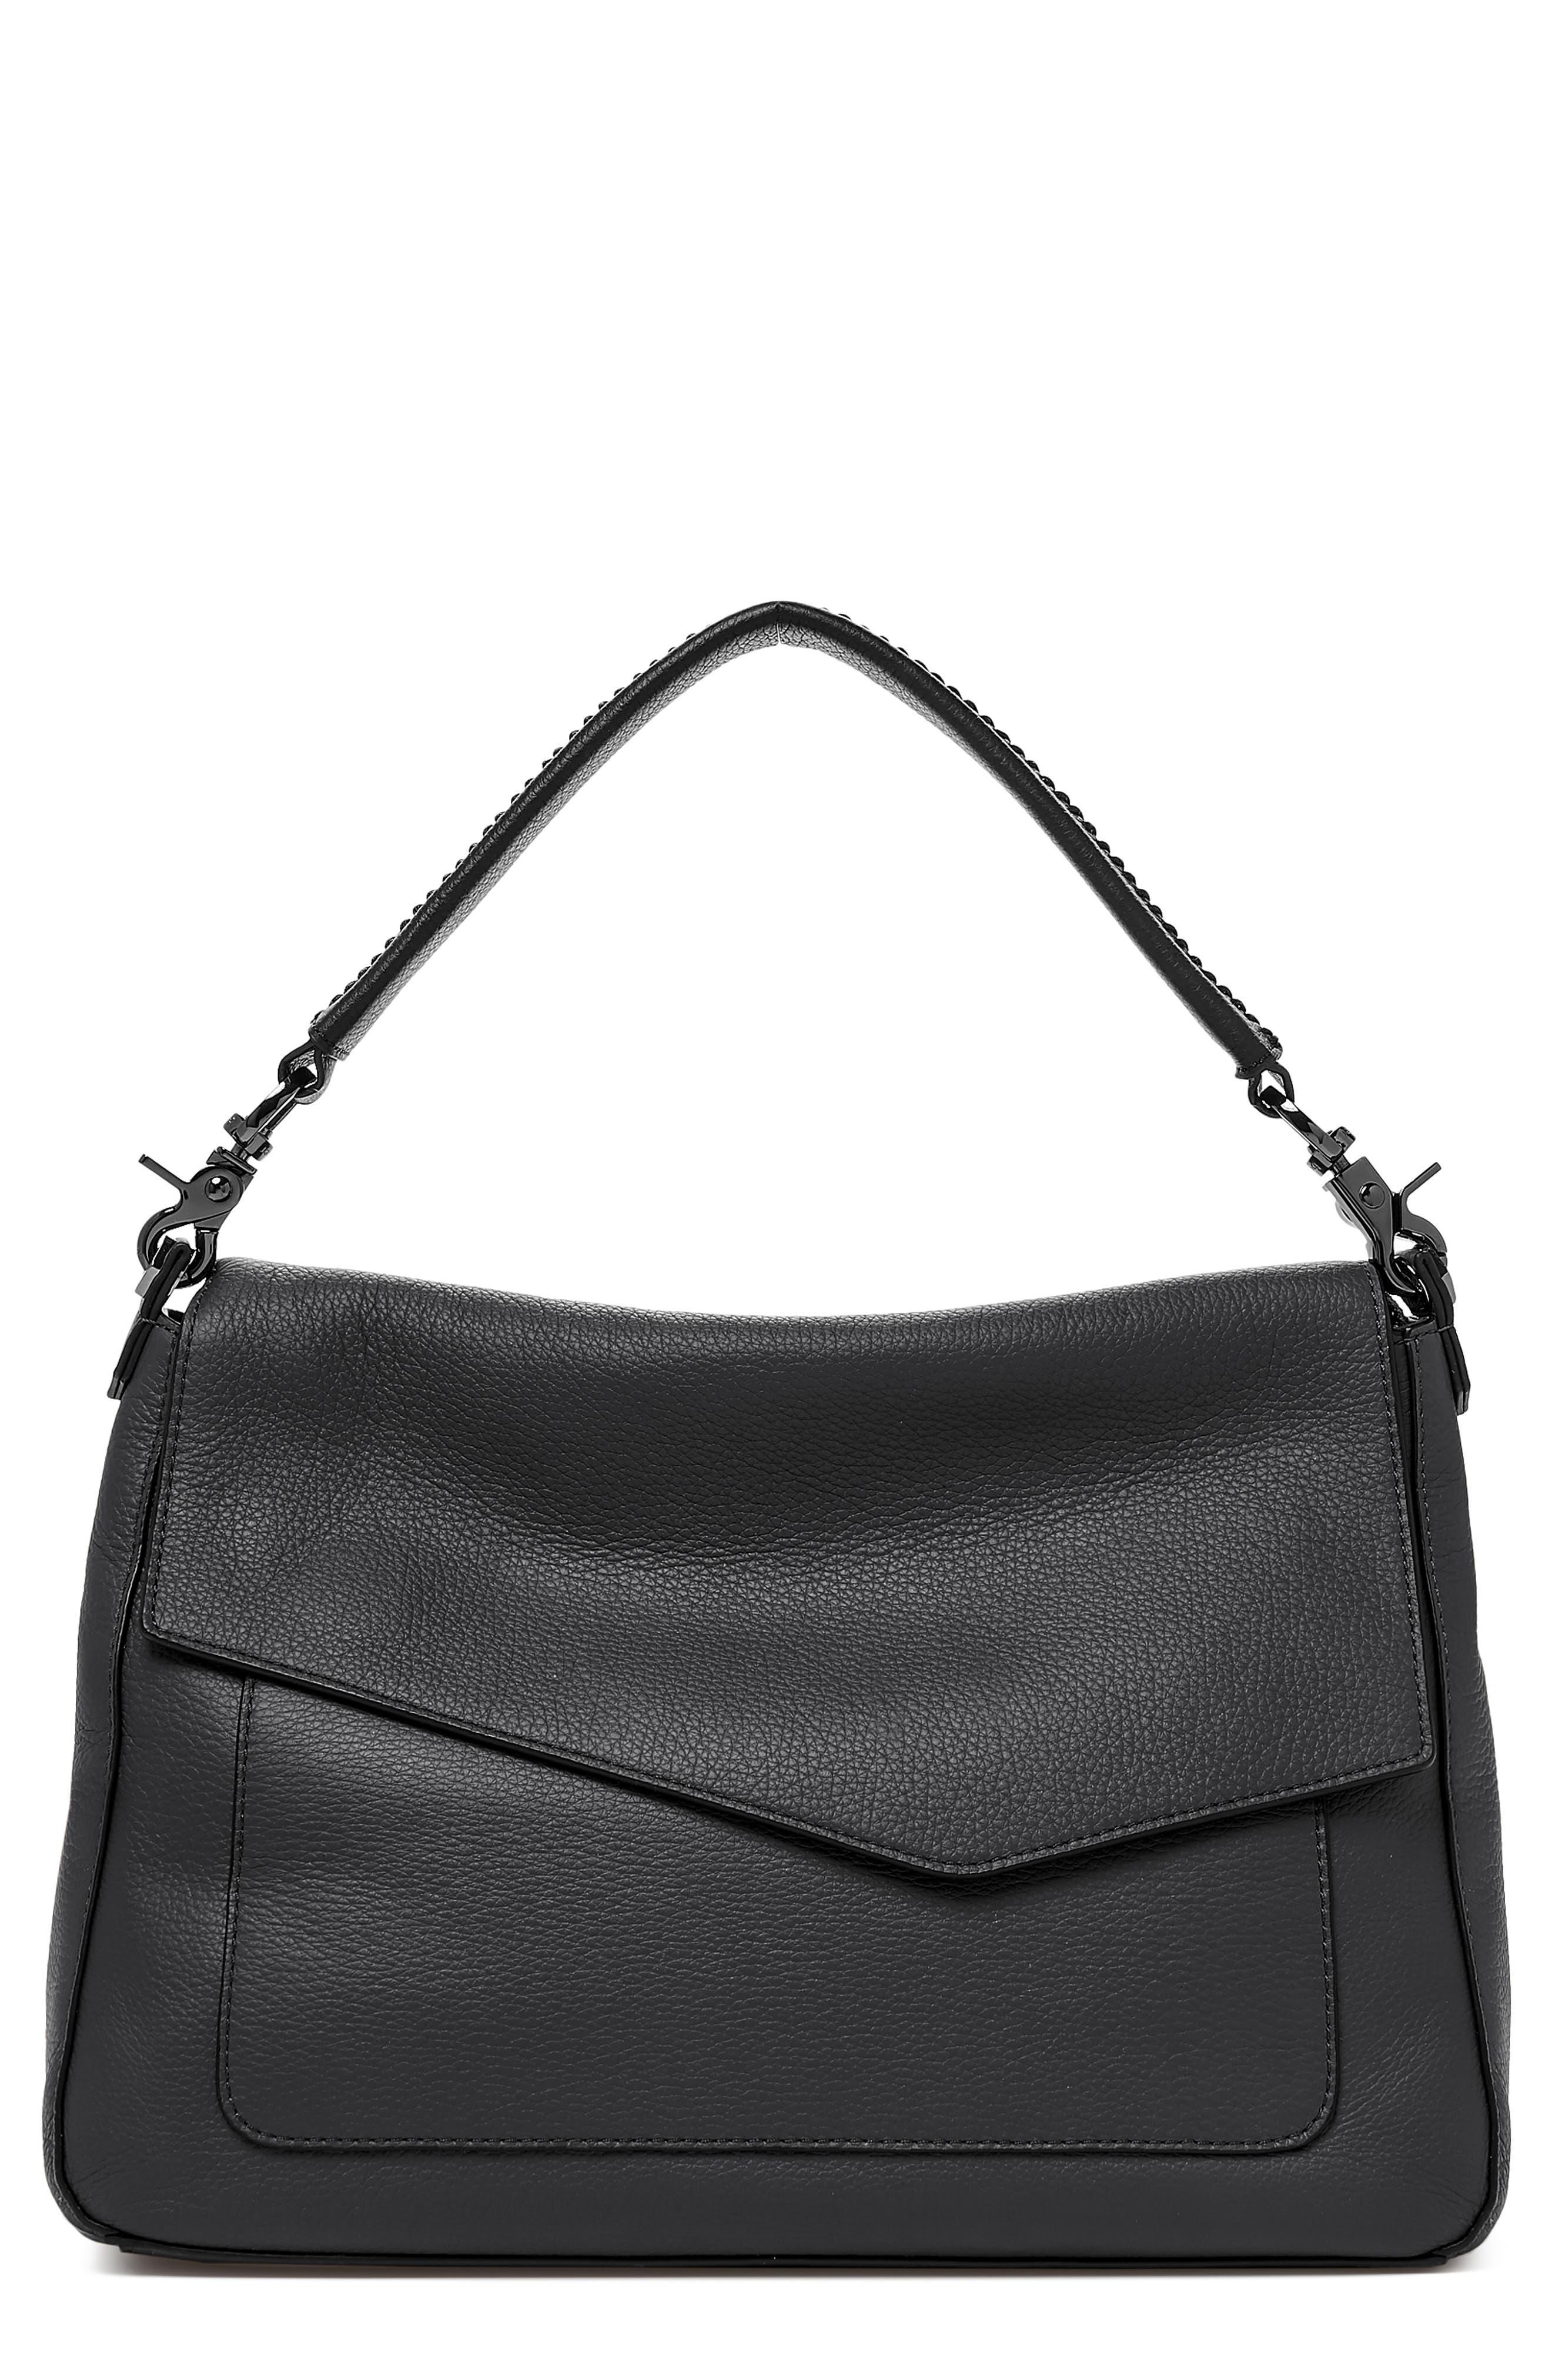 Cobble Hill Slouch Calfskin Leather Hobo,                             Main thumbnail 1, color,                             BLACK